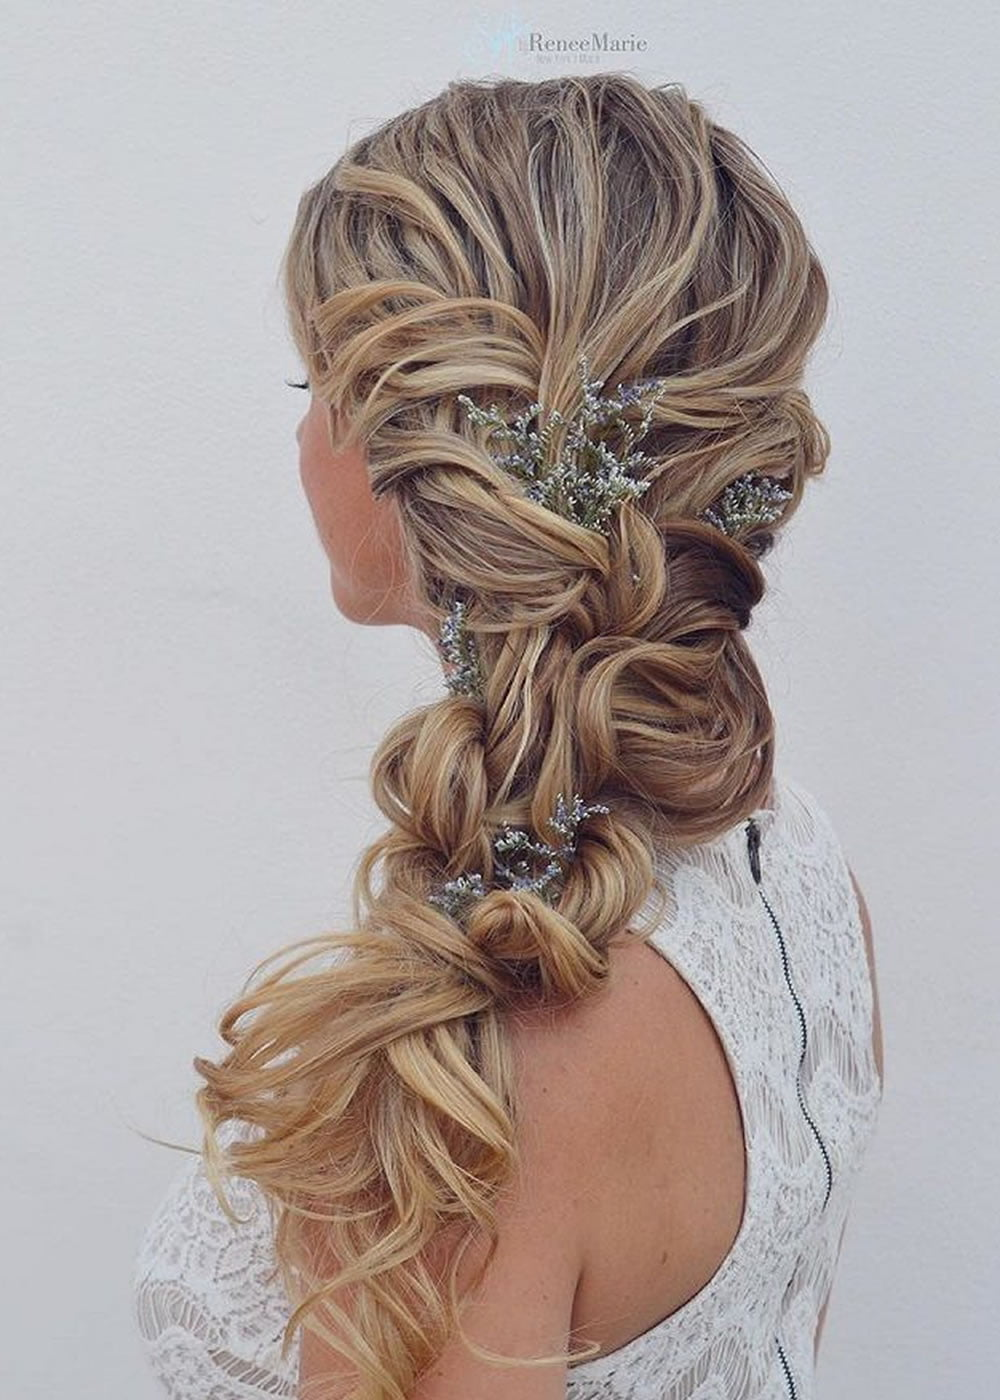 25 Very Stylish Soft Braided Hairstyles Ideas 2018-2019